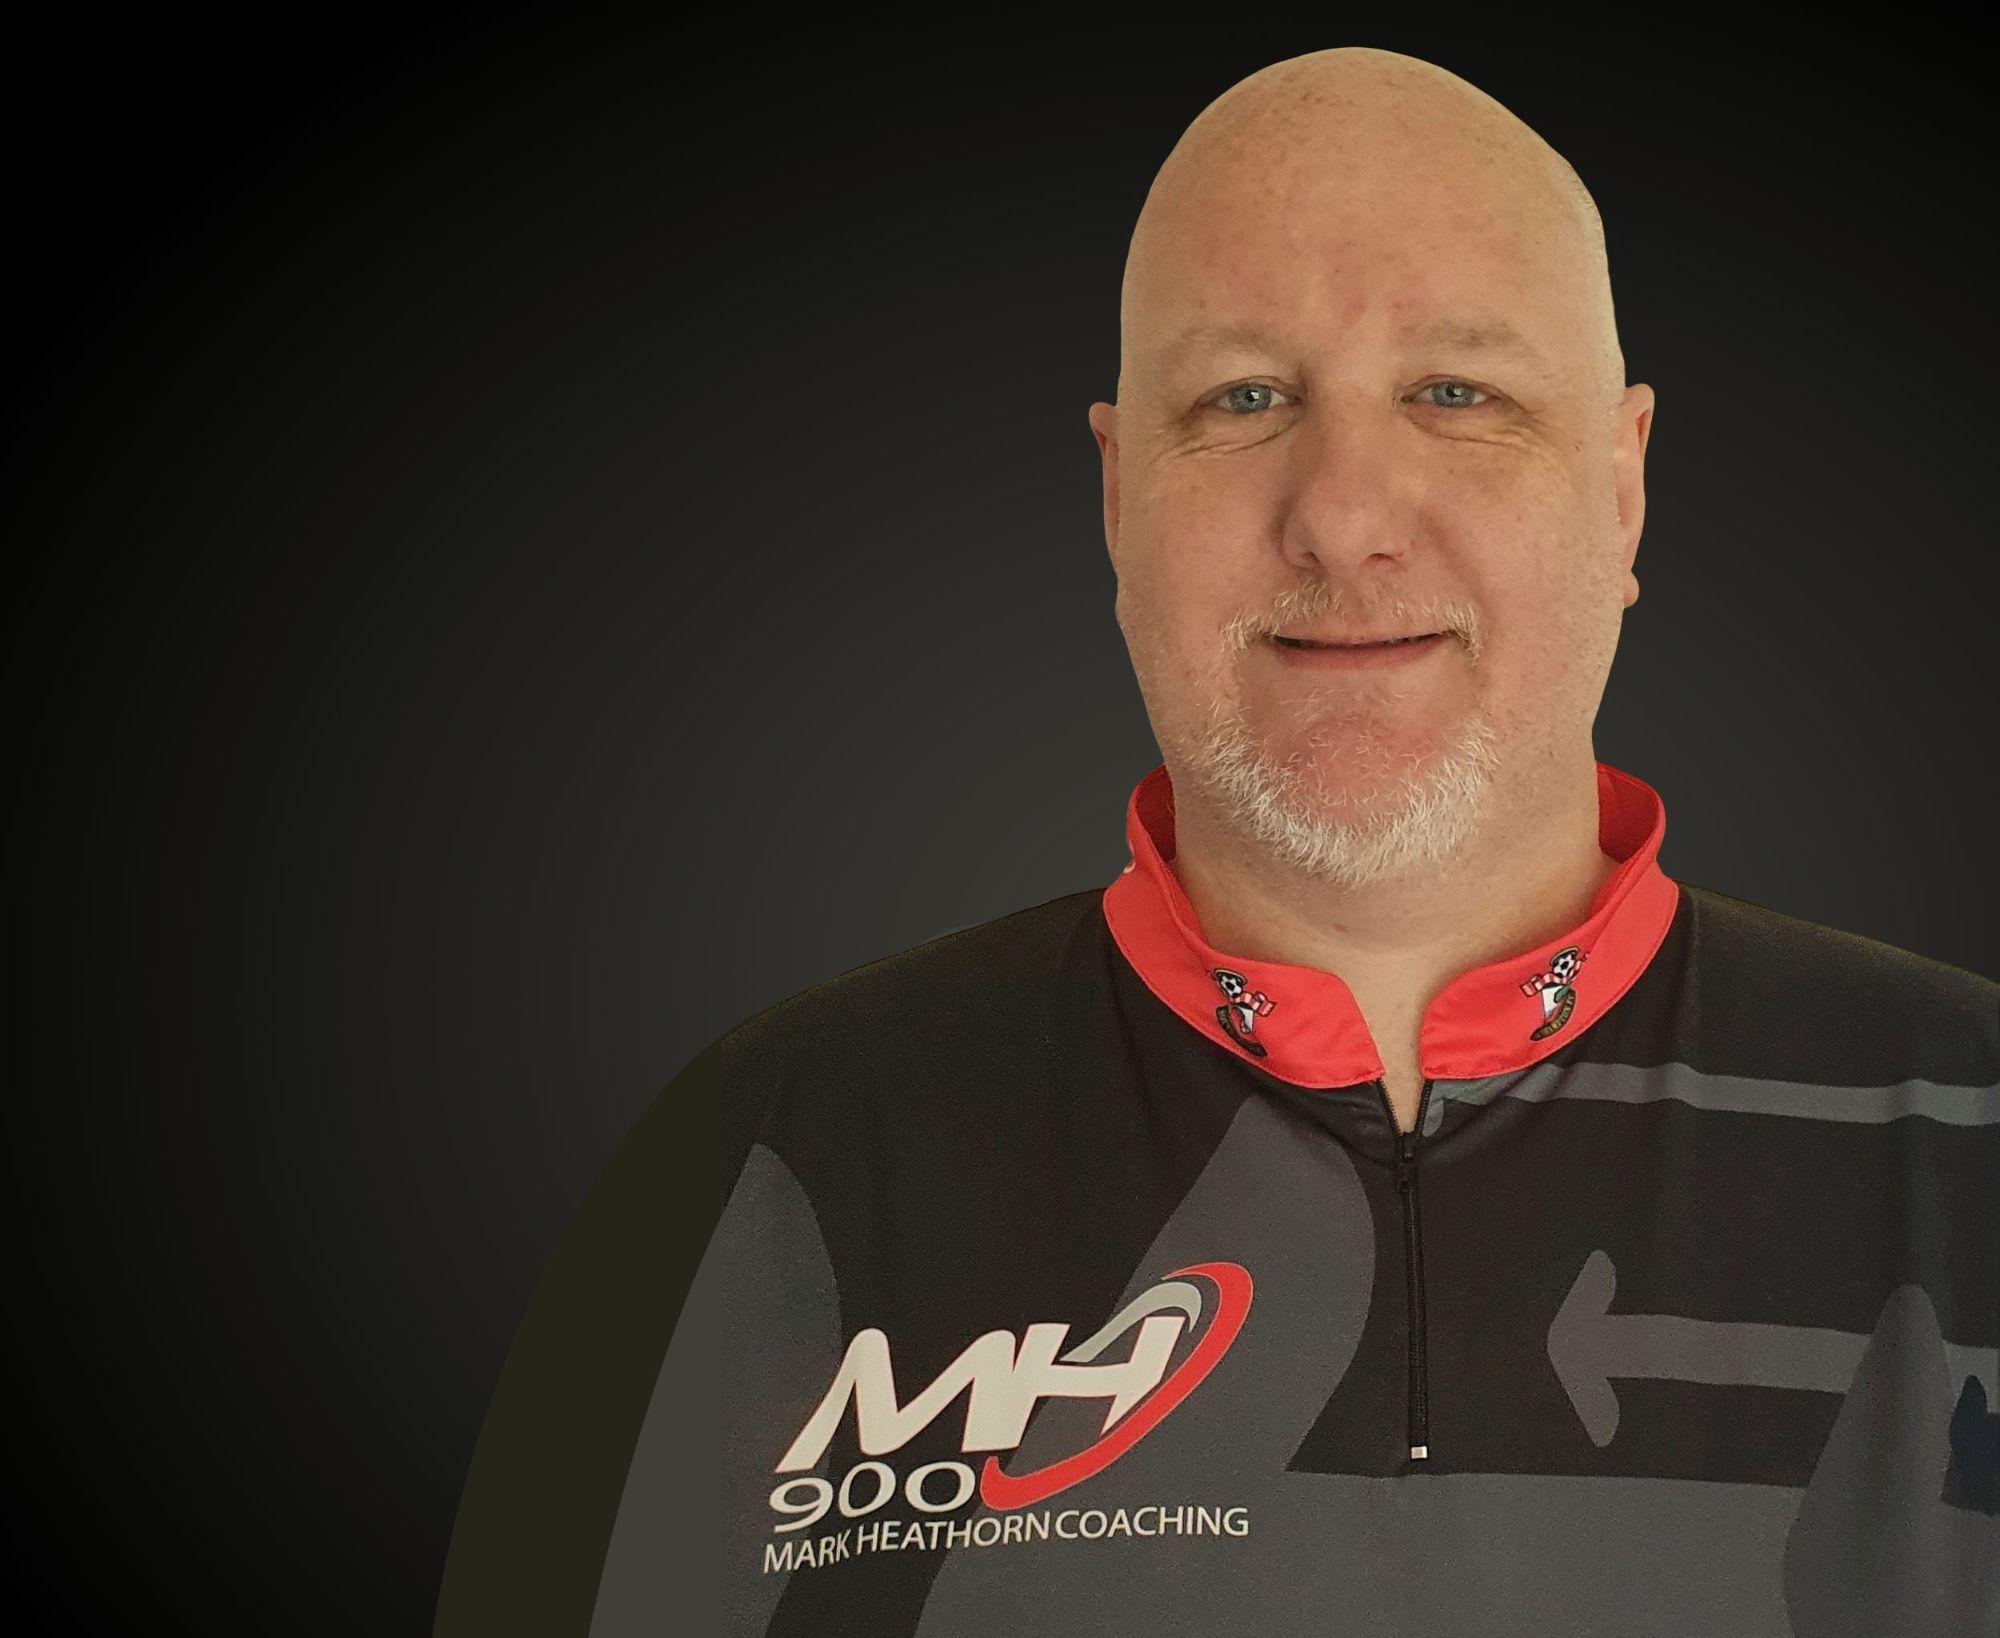 Mark Heathorn - ETBF Level 3 Ten pin Bowling Coach